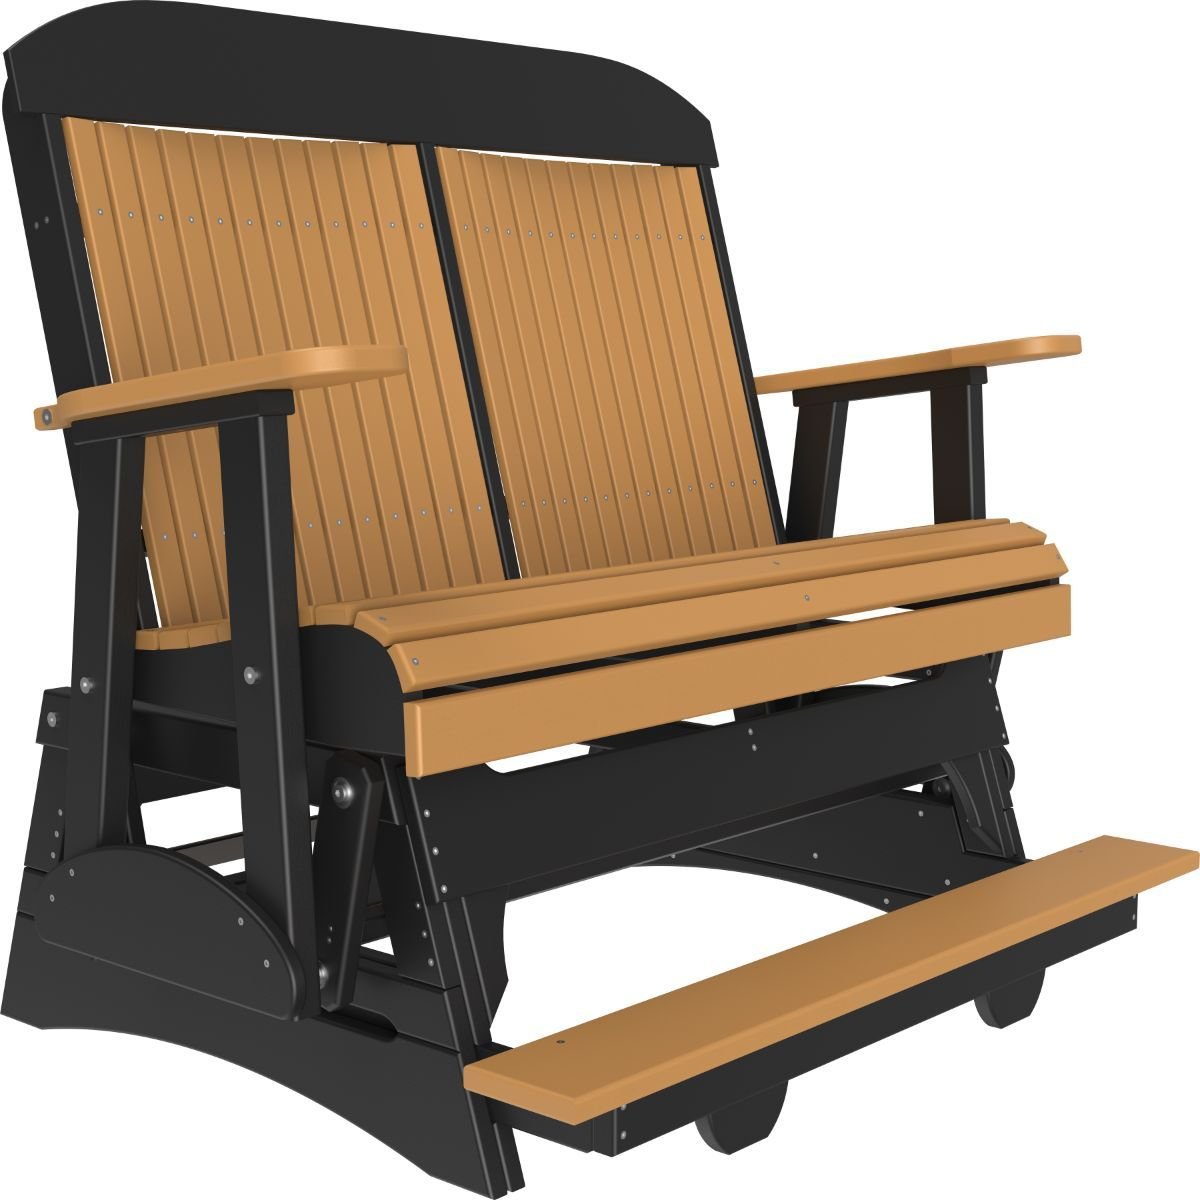 Cedar and Black Stockton Loveseat Balcony Glider